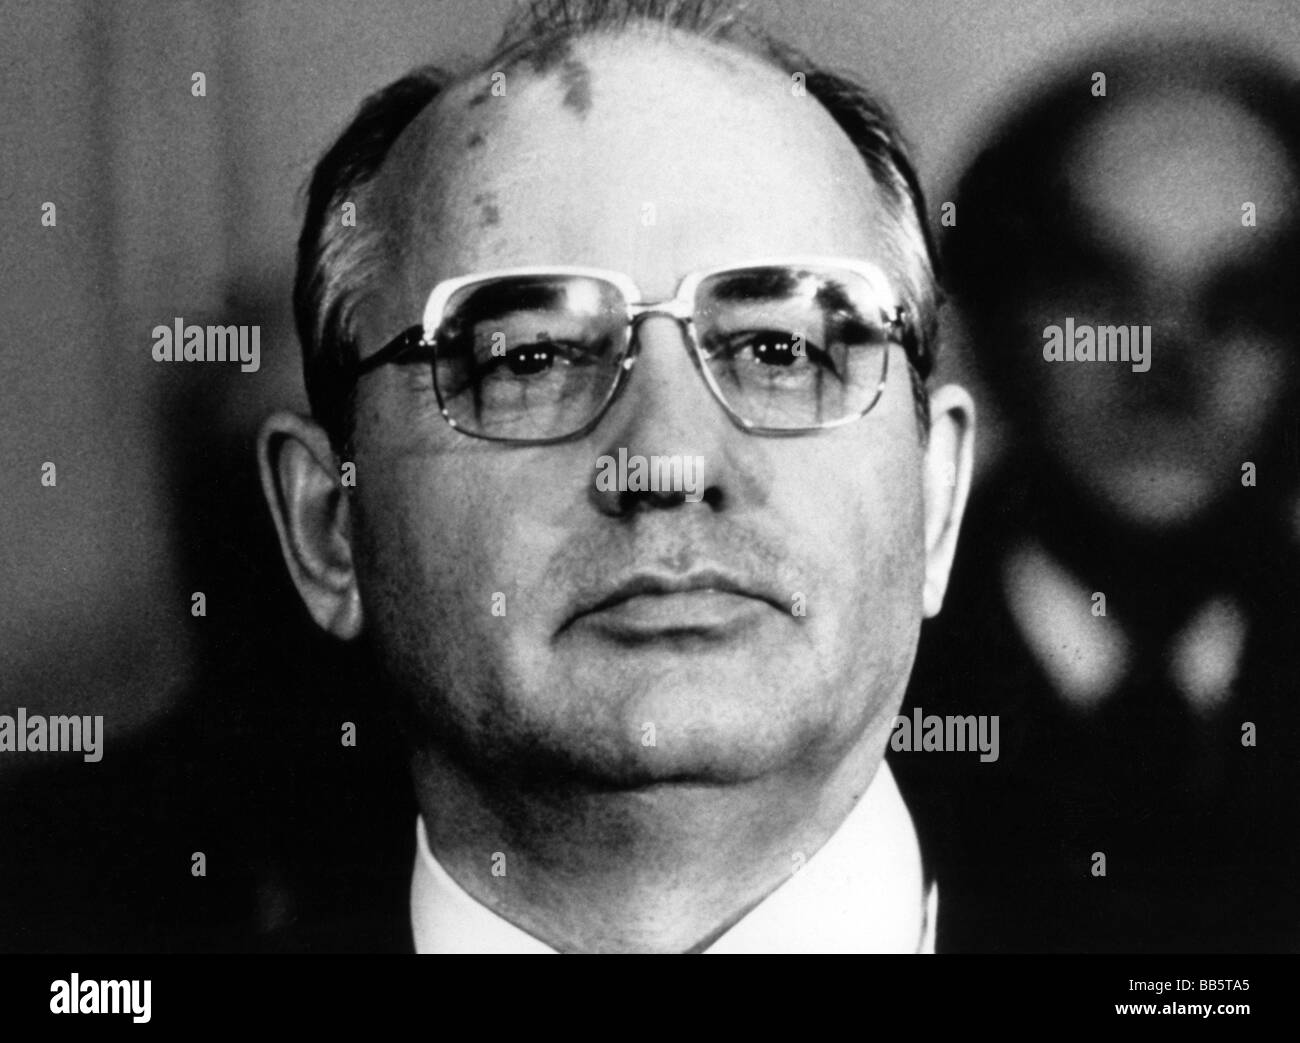 Gorbachev, Mikhail, * 2.3.1931, Soviet politician (KPdSU), portrait, 1980s, Additional-Rights-Clearances-NA - Stock Image